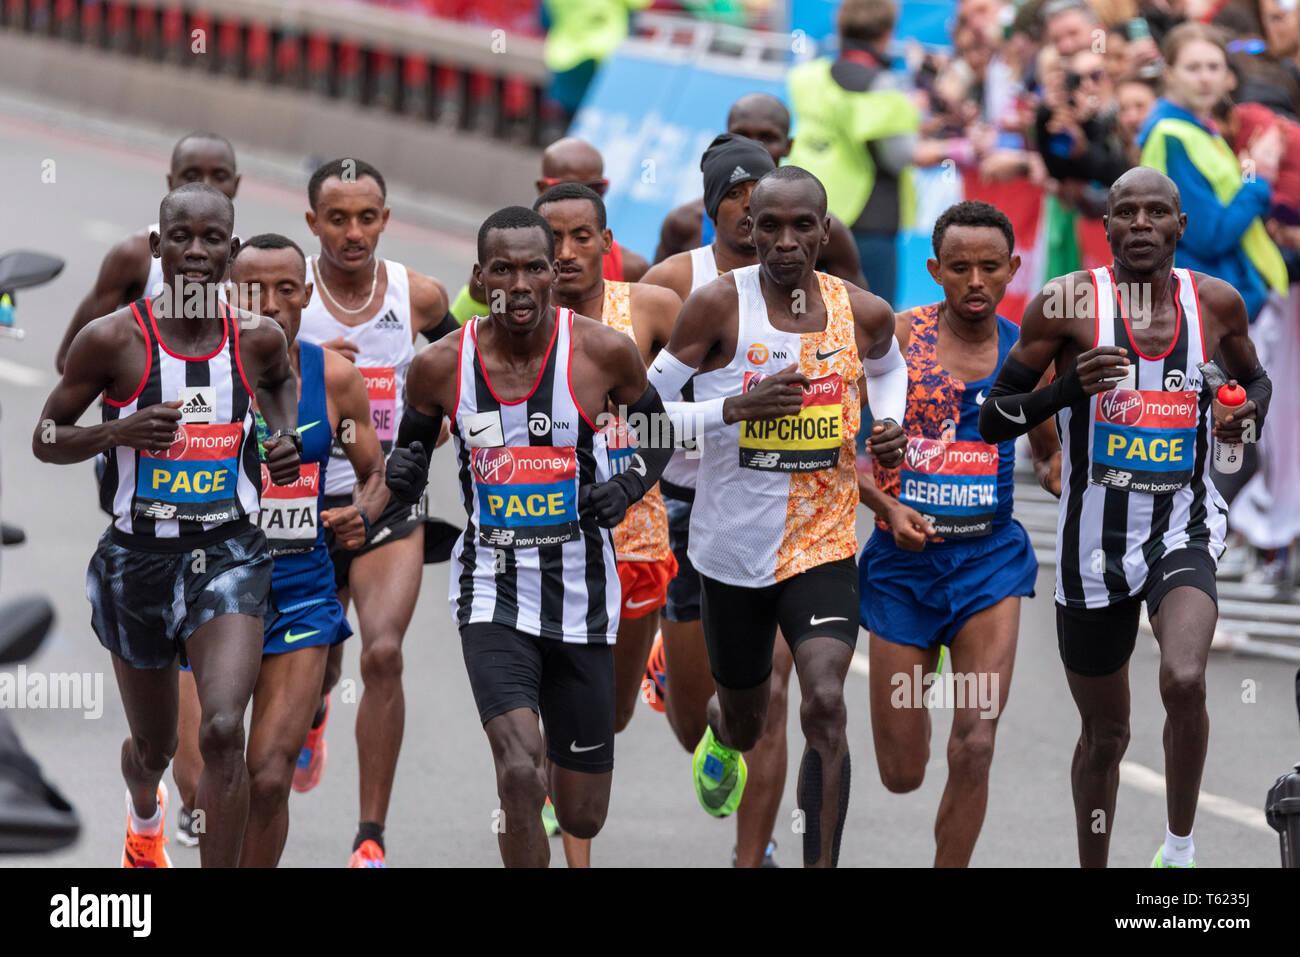 Elite men's group racing at the Virgin Money London Marathon 2019, UK - Stock Image